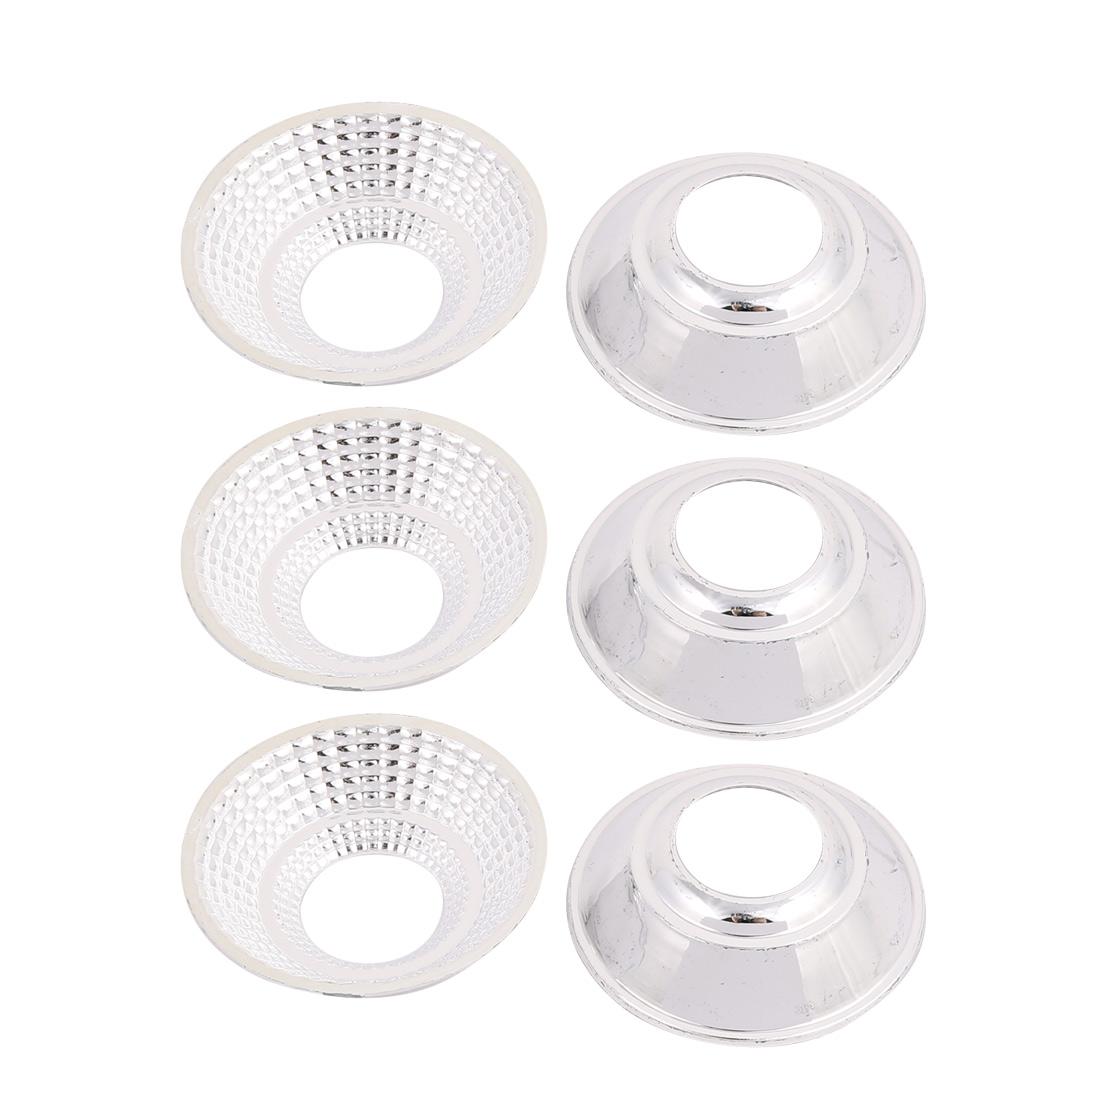 6Pcs D50mm H13mm Plastic  Light Lamp Reflector Cup for  COB Flashlight